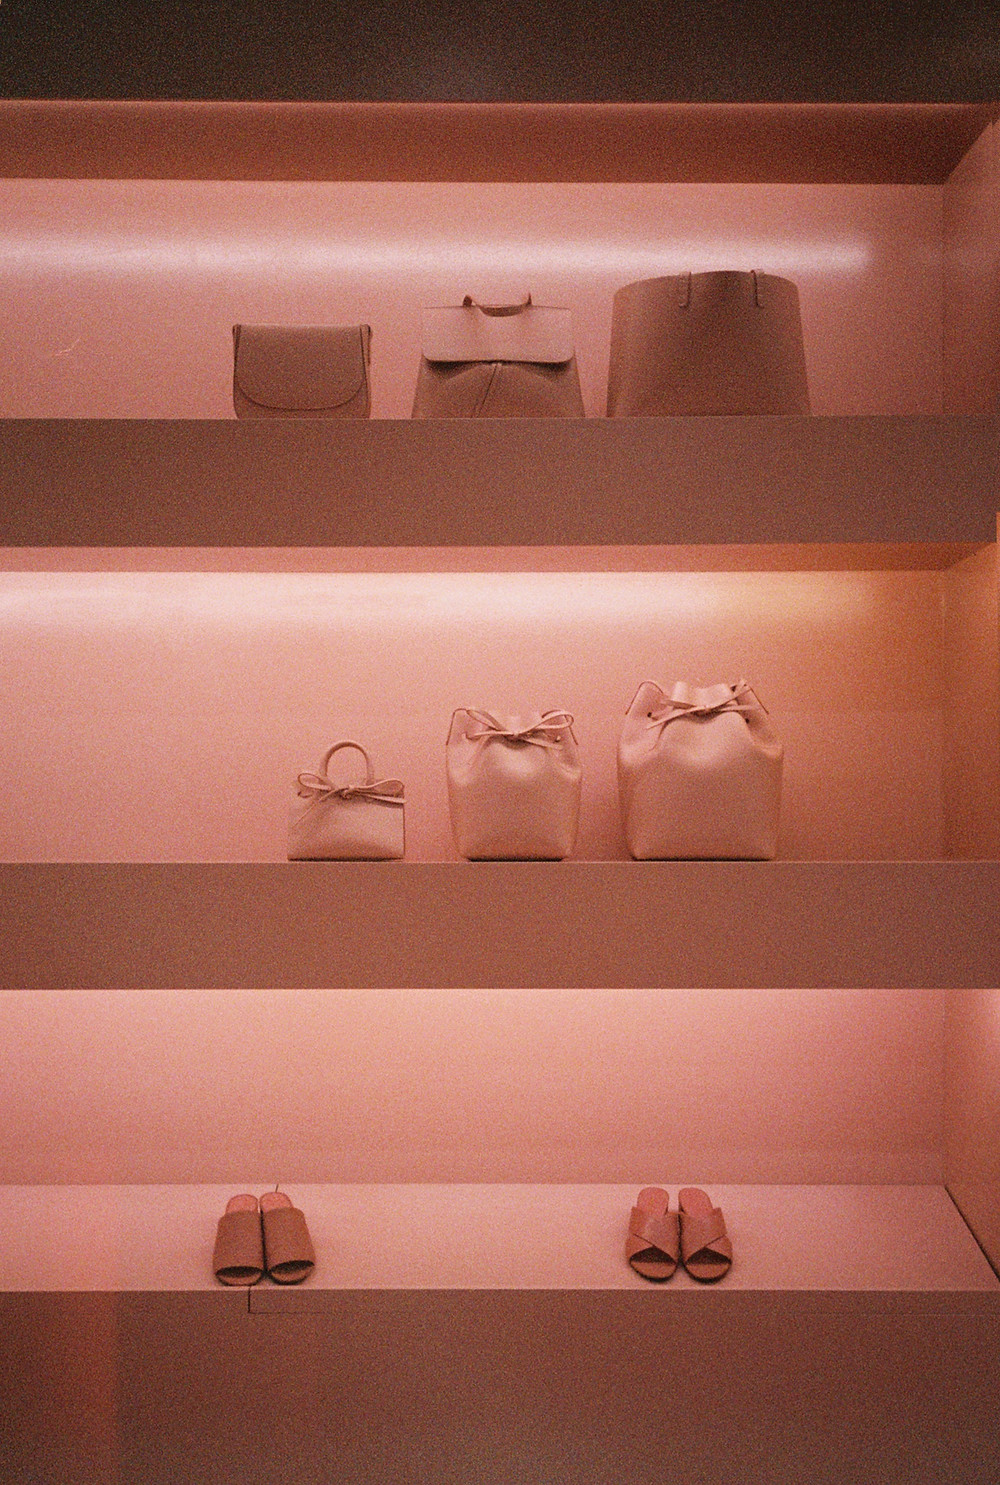 Mansur Gavriel store in Soho New York, an elegant pink fashion boutique